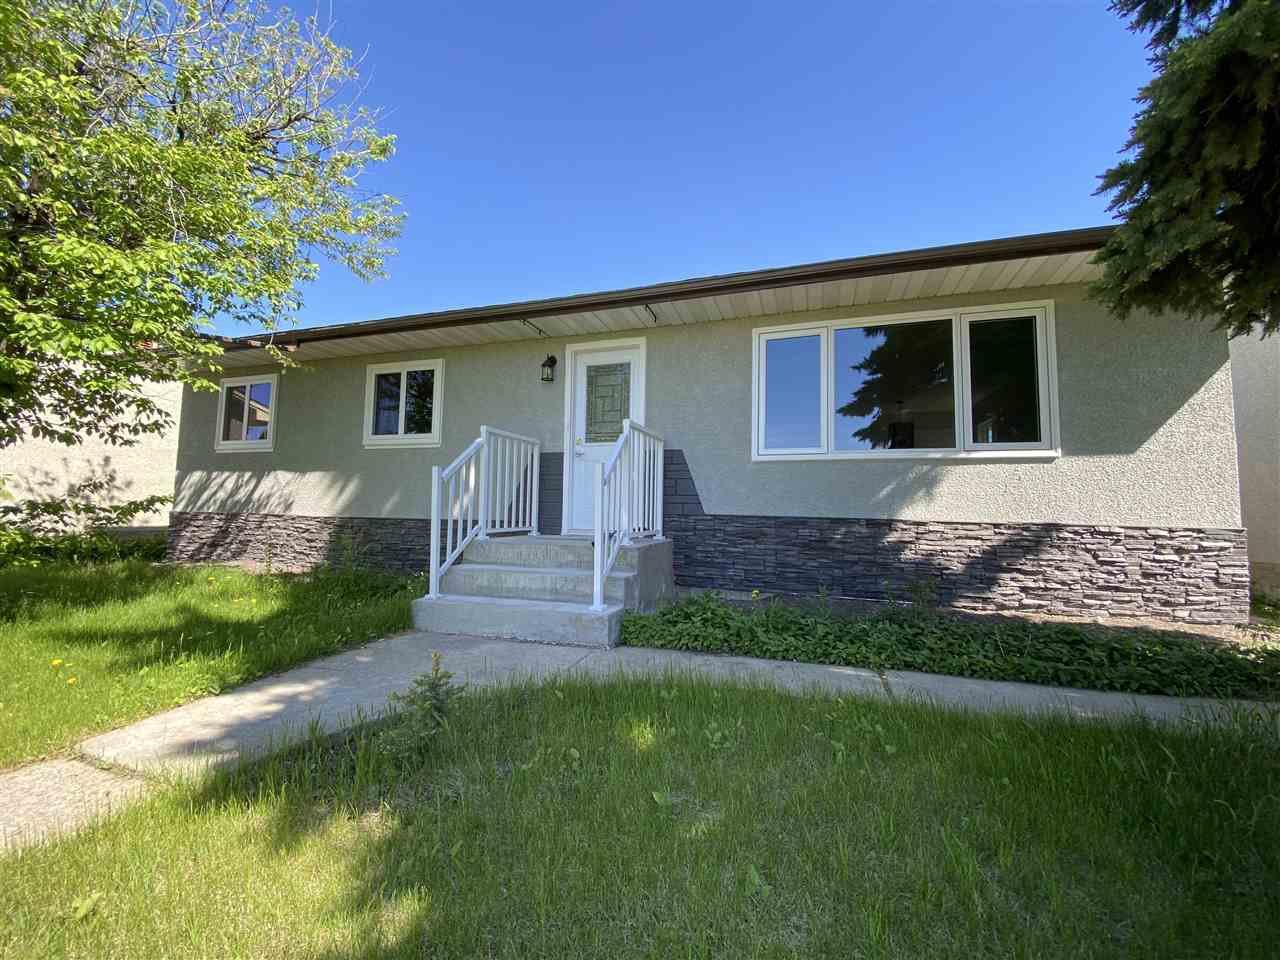 Main Photo: 12412 136 Avenue in Edmonton: Zone 01 House for sale : MLS®# E4198249